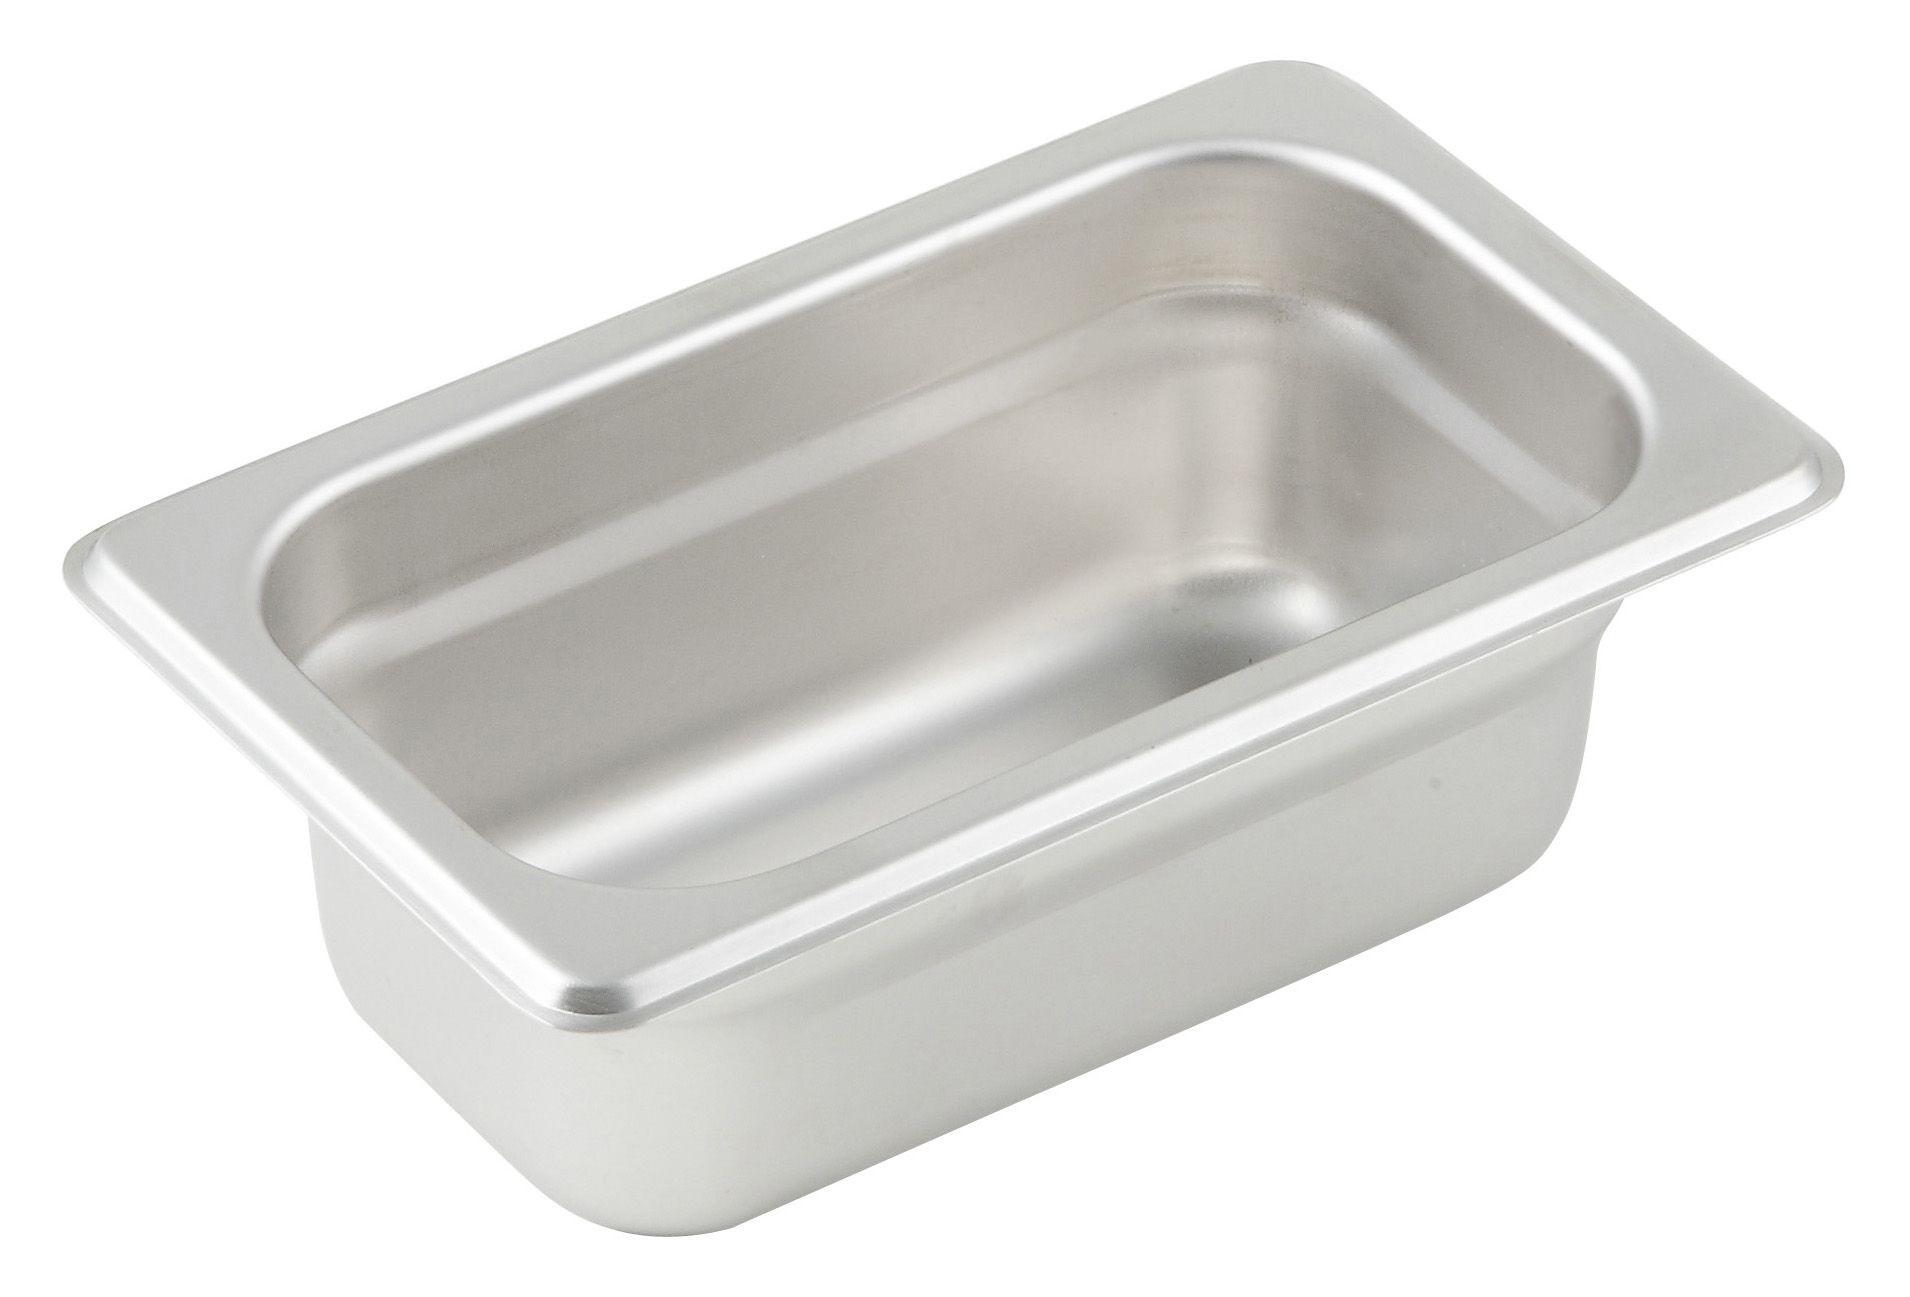 "Winco SPJP-902 1/9 Size Anti-Jam 23 Gauge Steam Table Pan 2-1/2"" Deep"